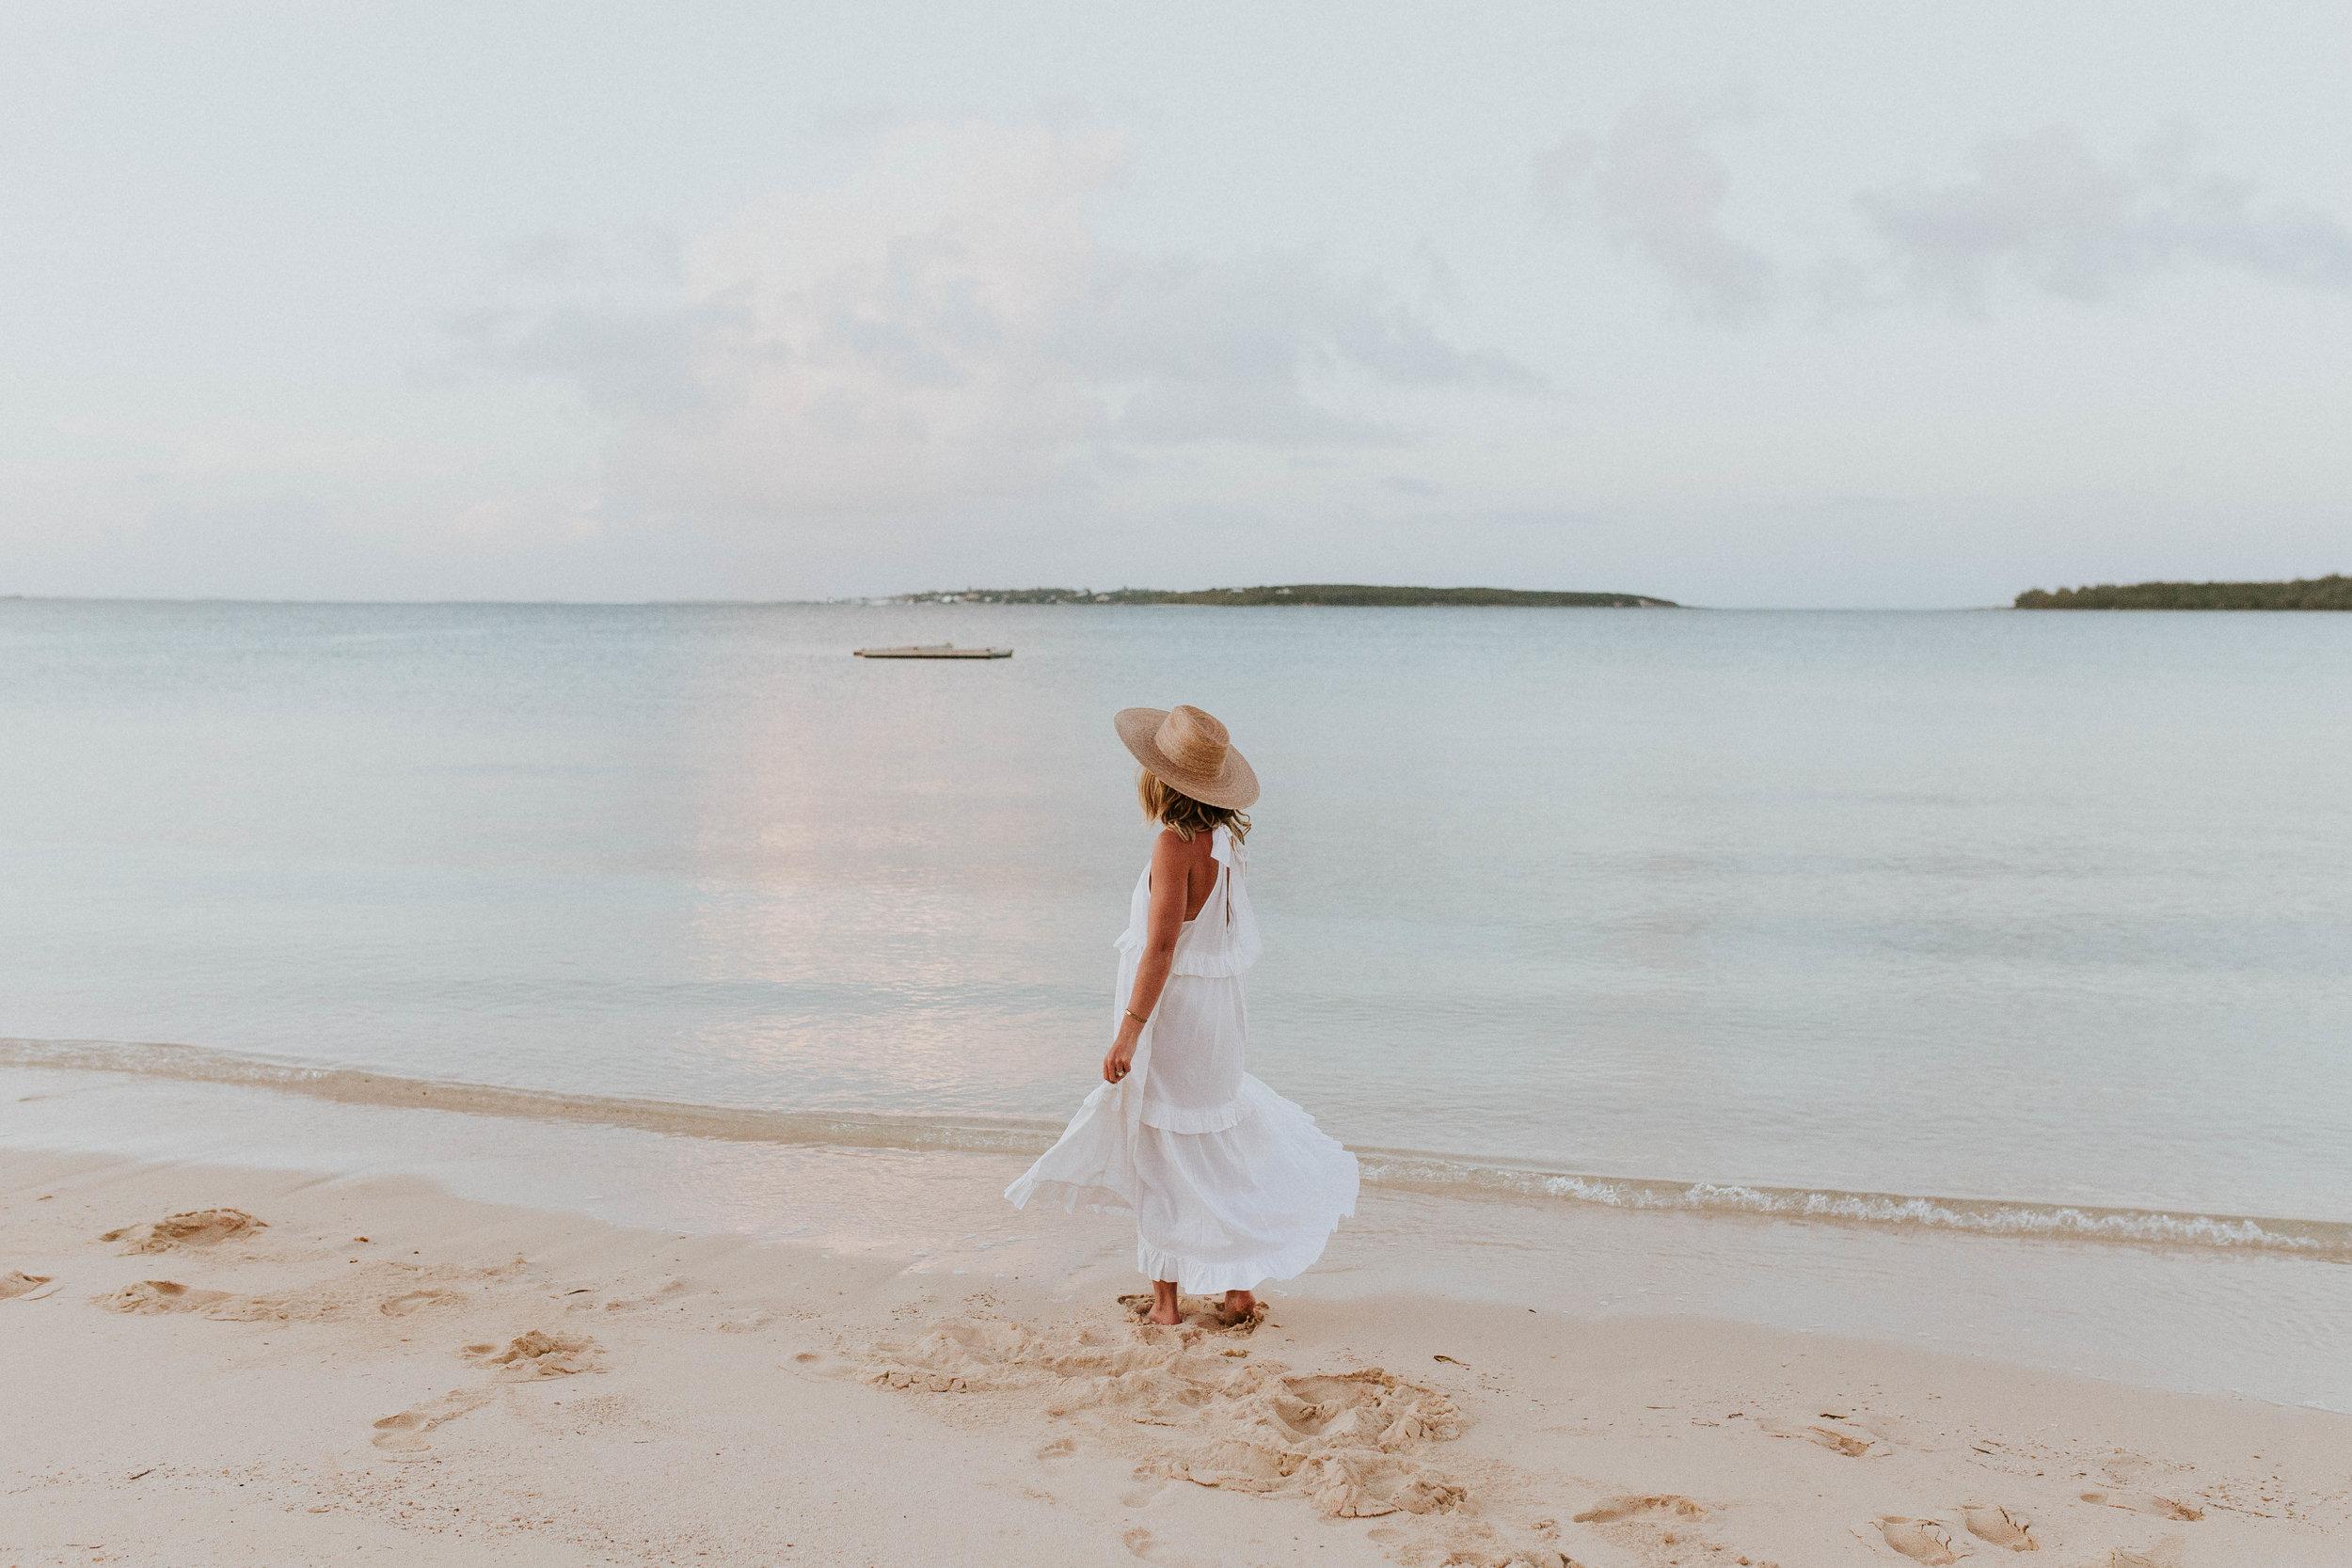 bahamasotherside7.jpg